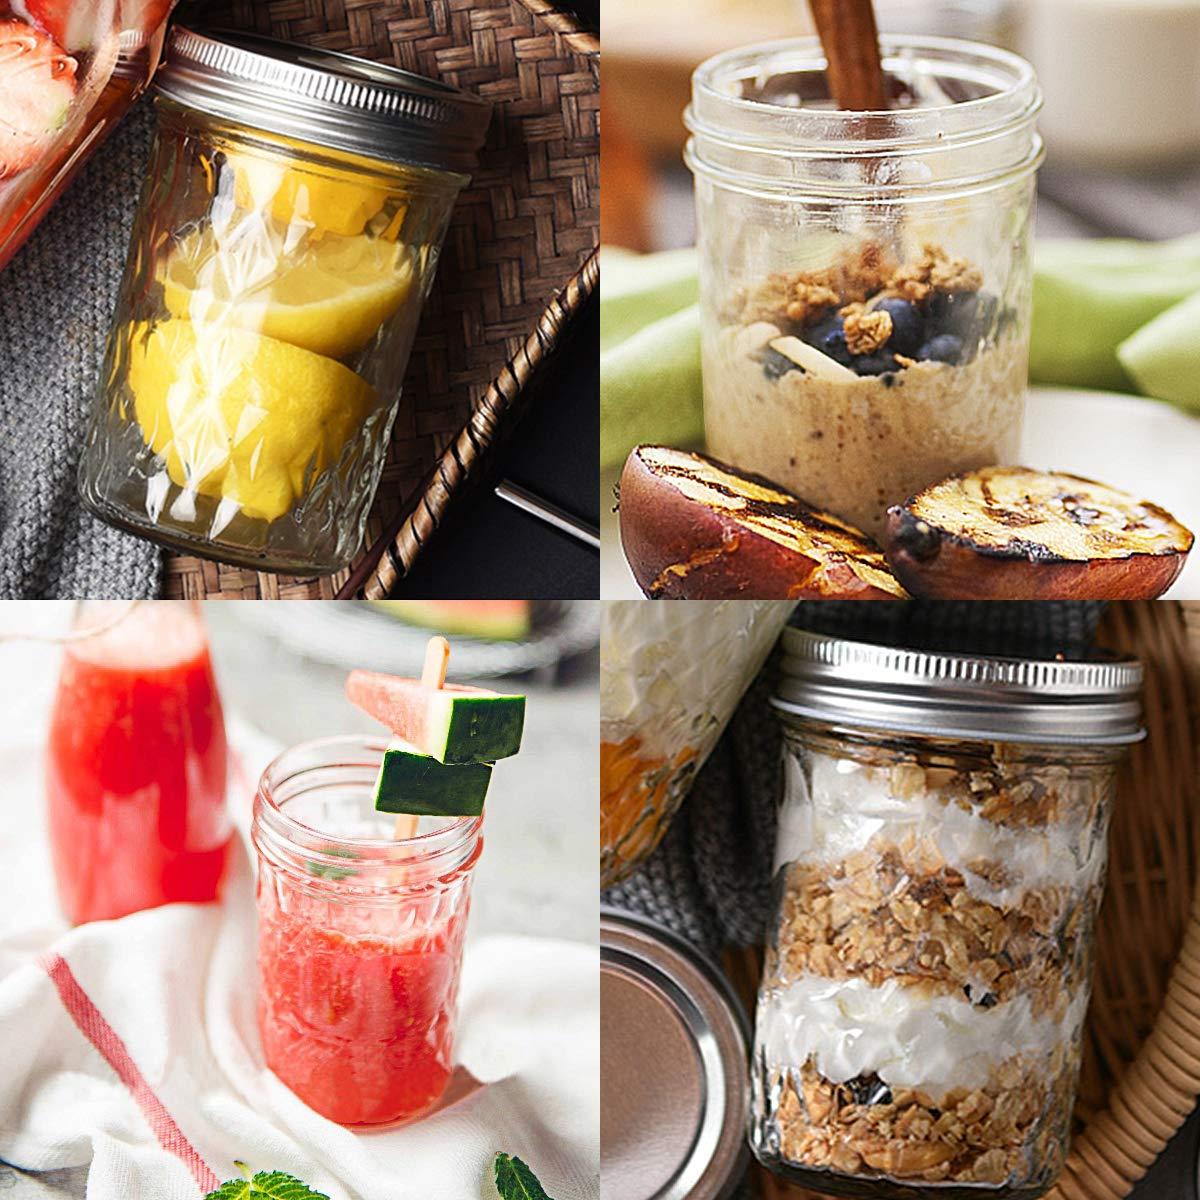 Mason Jars 8OZ, VERONES 8 OZ Canning Jars Jelly Jars With Regular Lids and Bands, Ideal for Jam, Honey, Wedding Favors, Shower Favors, Baby Foods, 30 PACK by VERONES (Image #3)